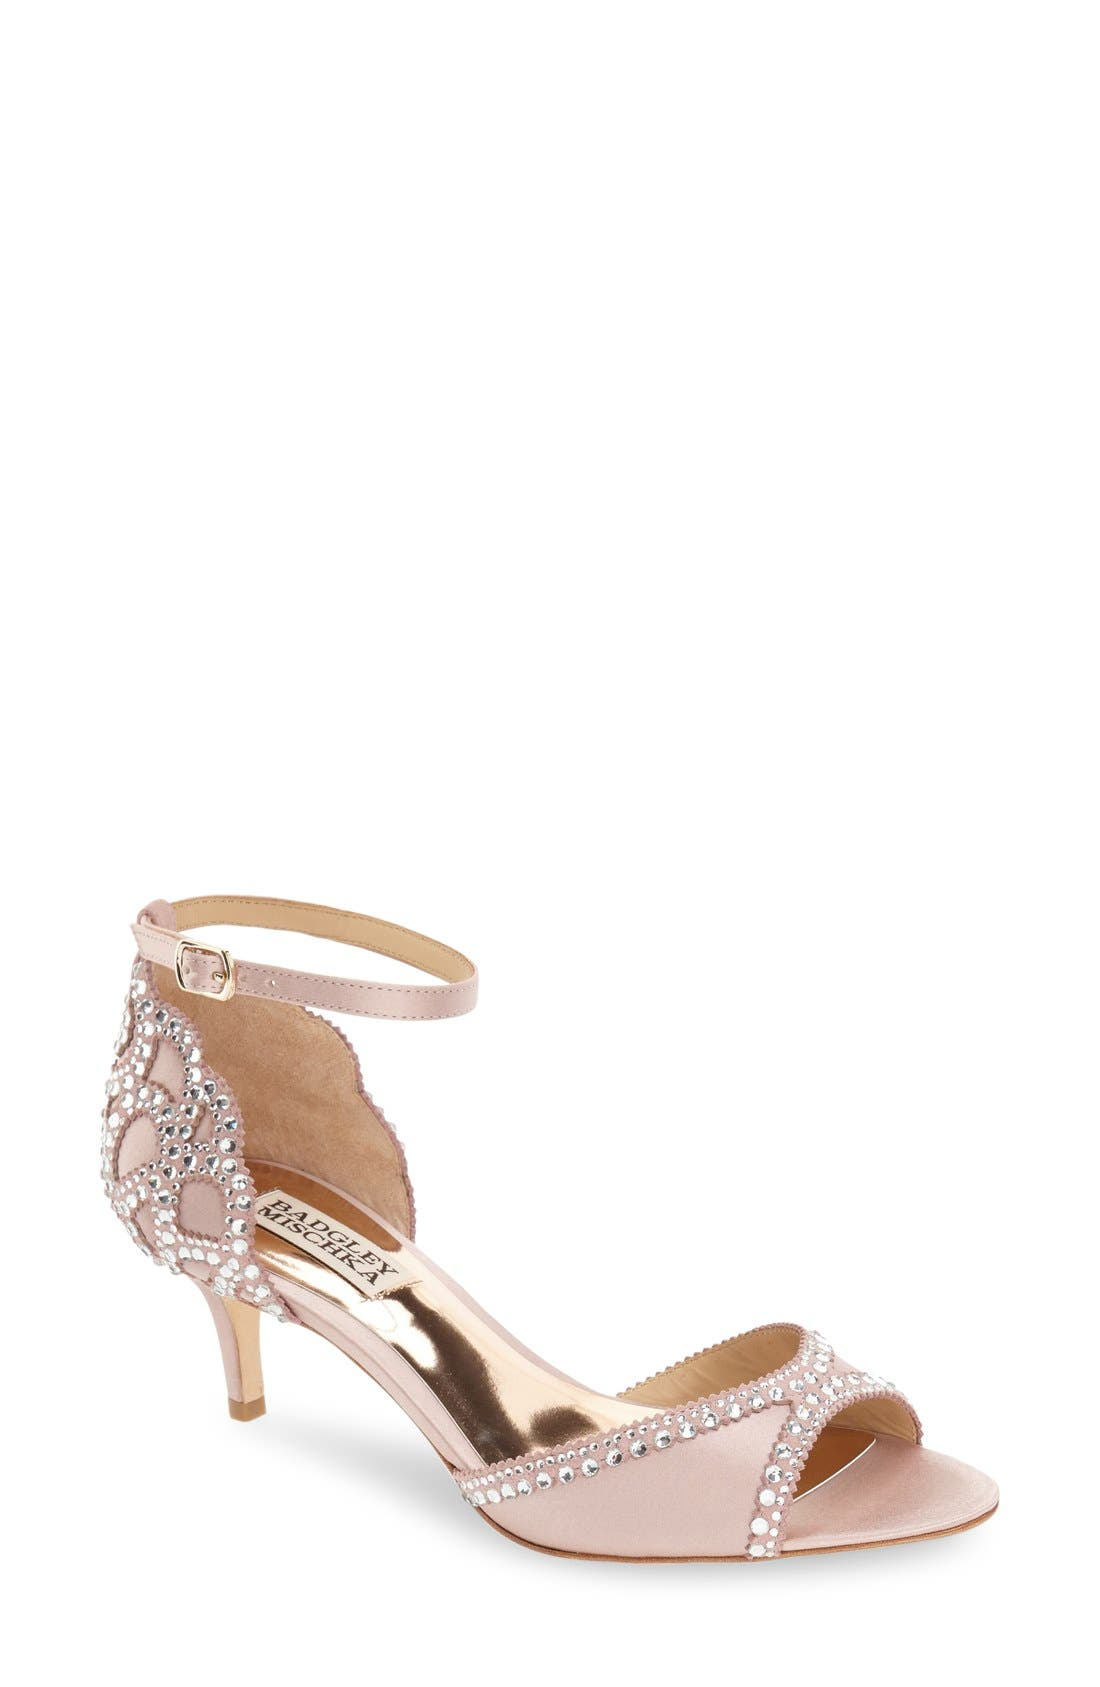 Badgley Mischka 'Gillian' Crystal Embellished d'Orsay Sandal (Women)